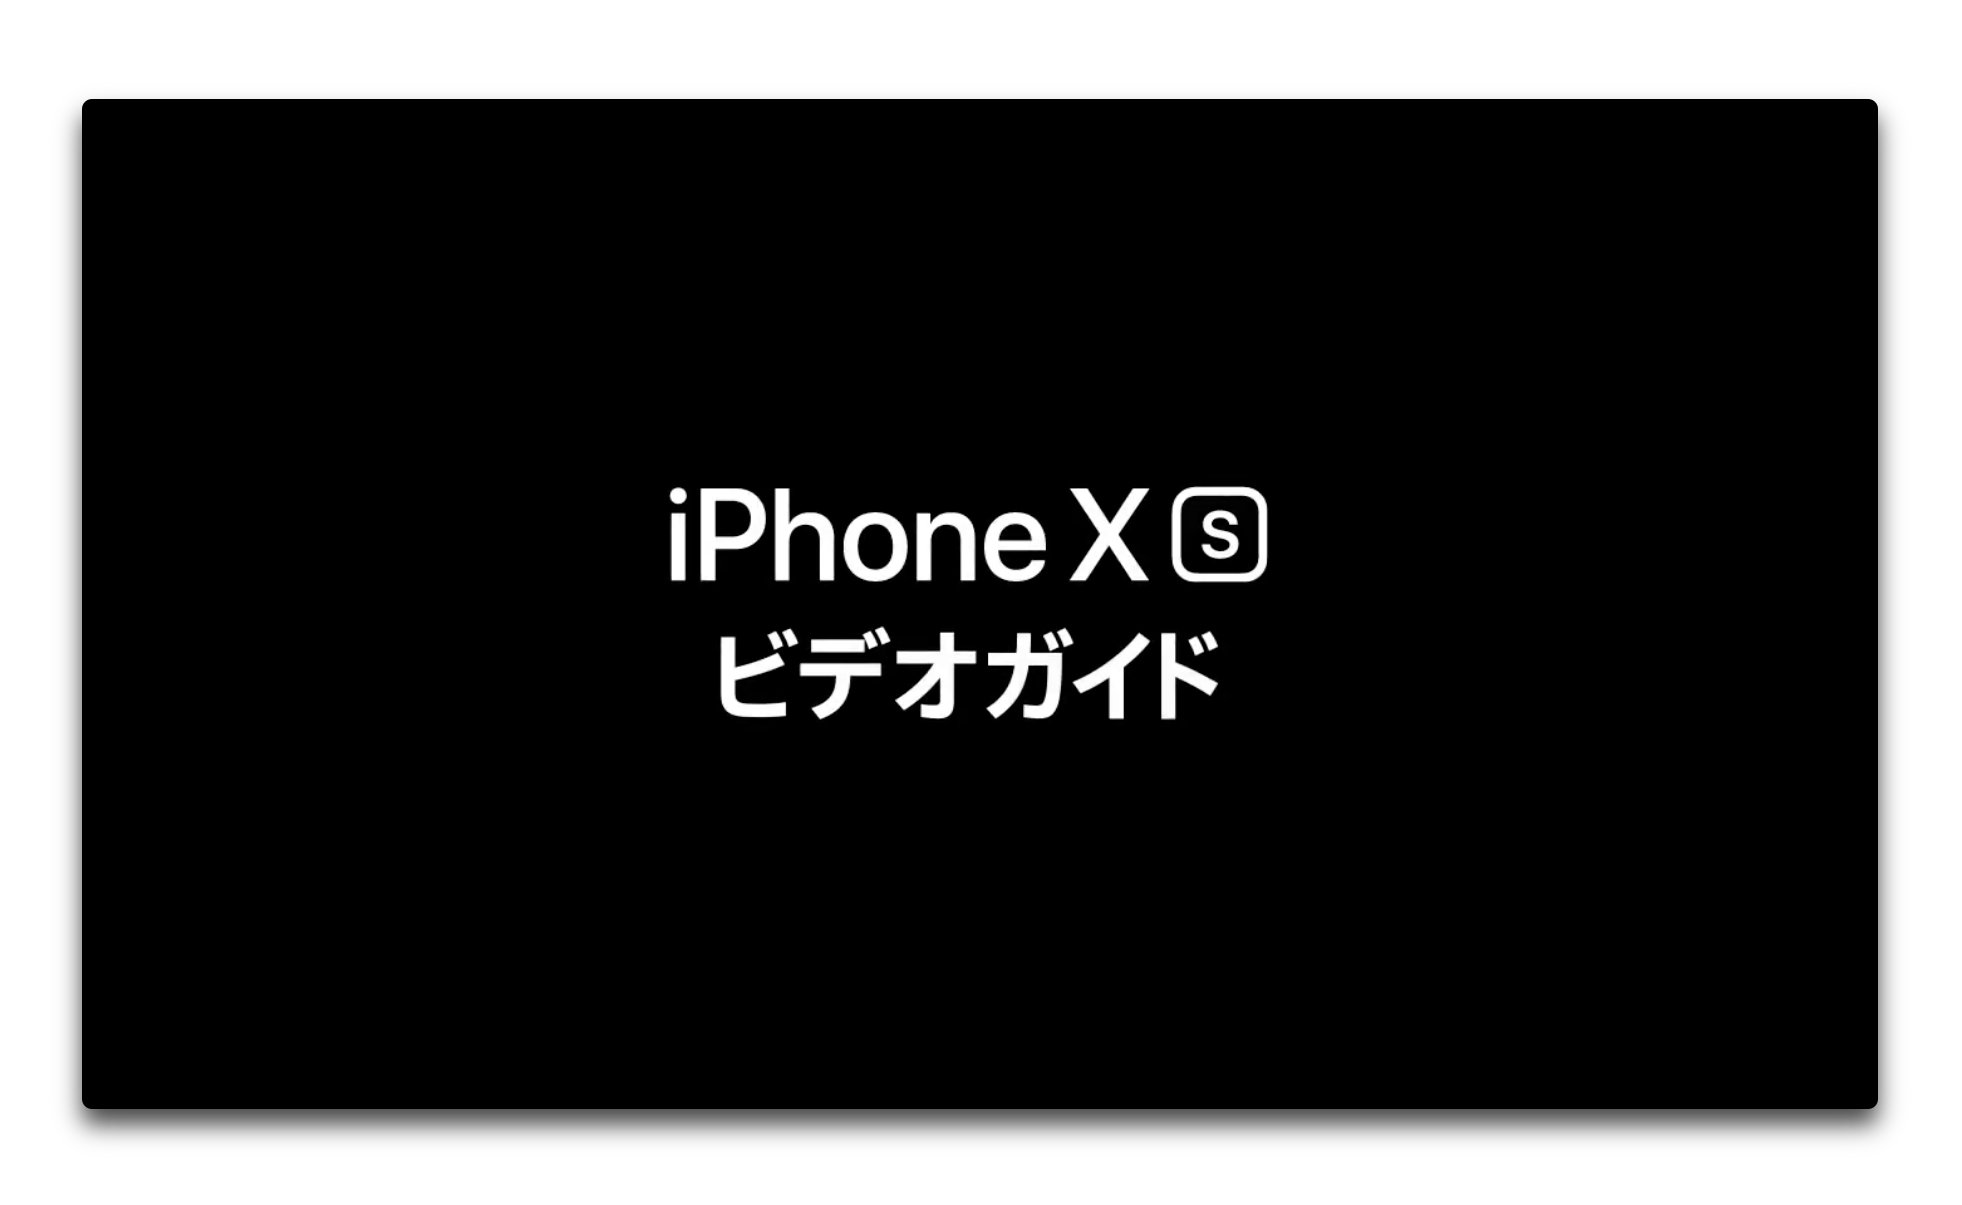 Apple Japan、iPhone XS、iPhone XS/XS Maxの機能を紹介するビデオガイドを公開